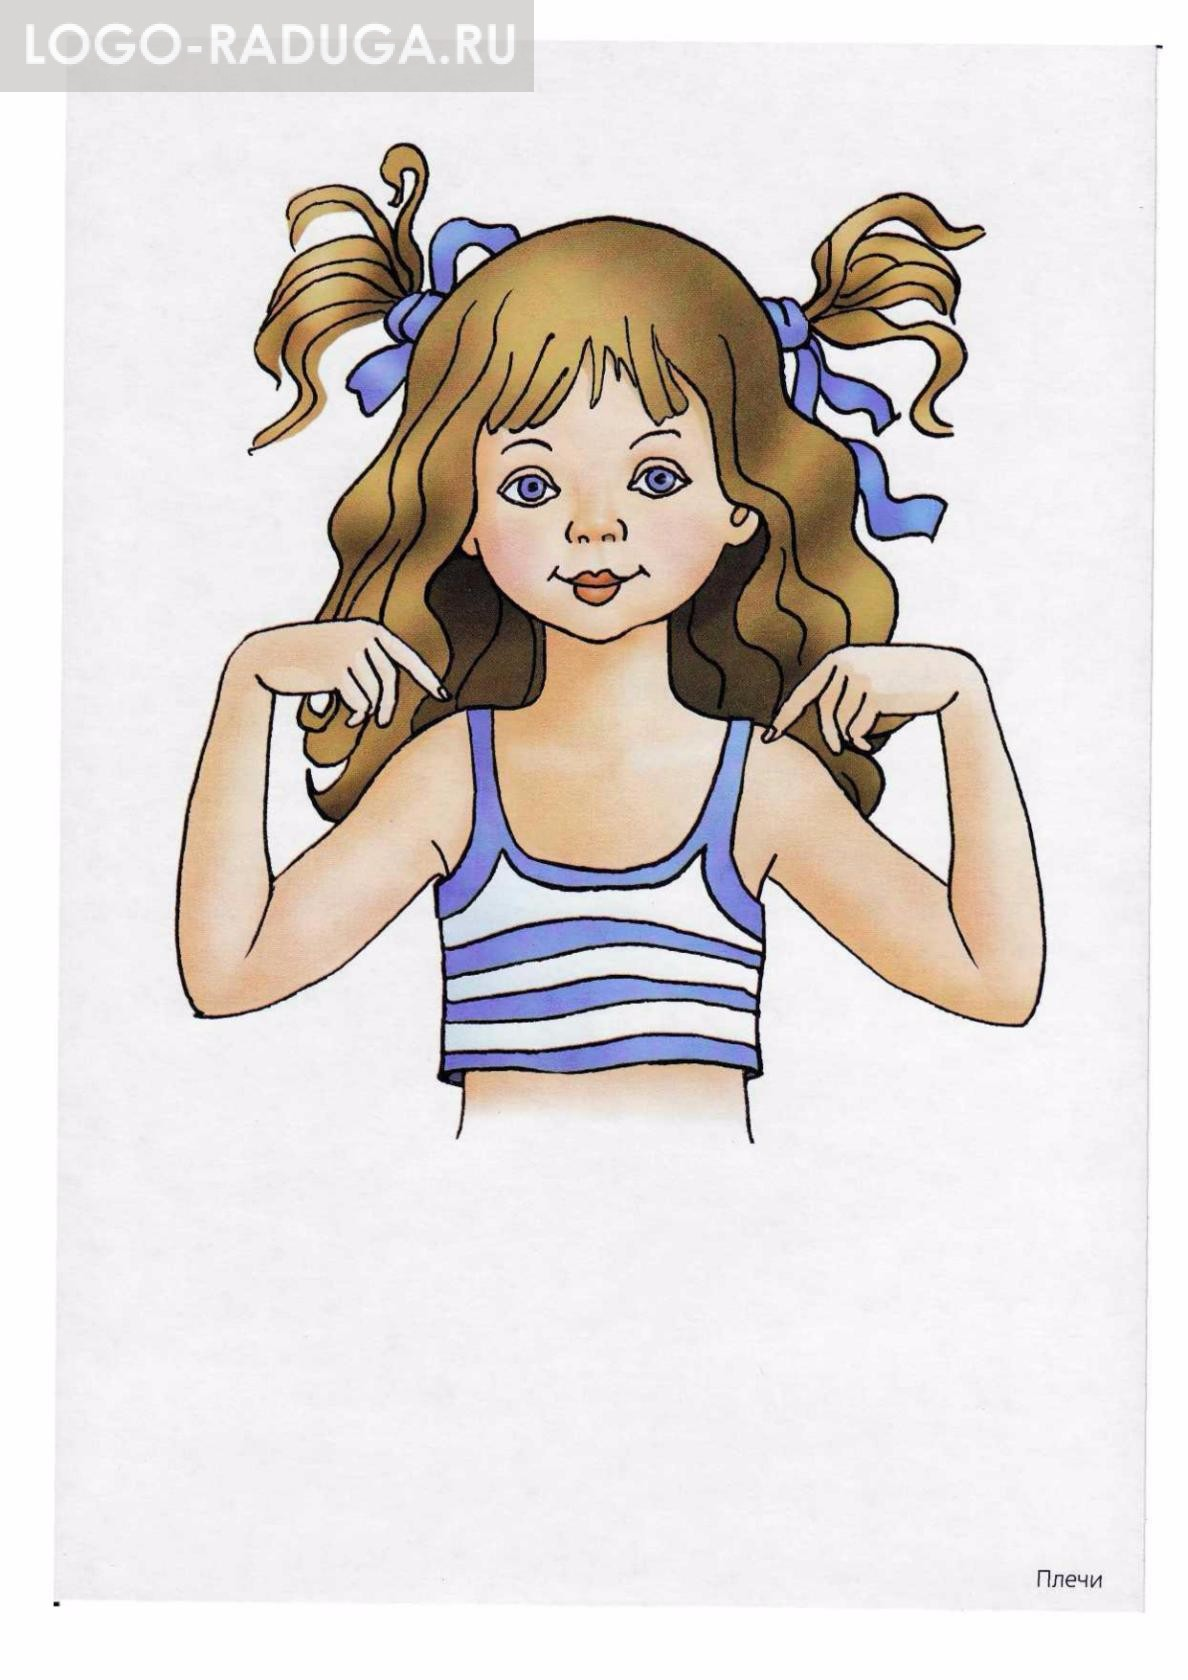 Рисунок на плече детский